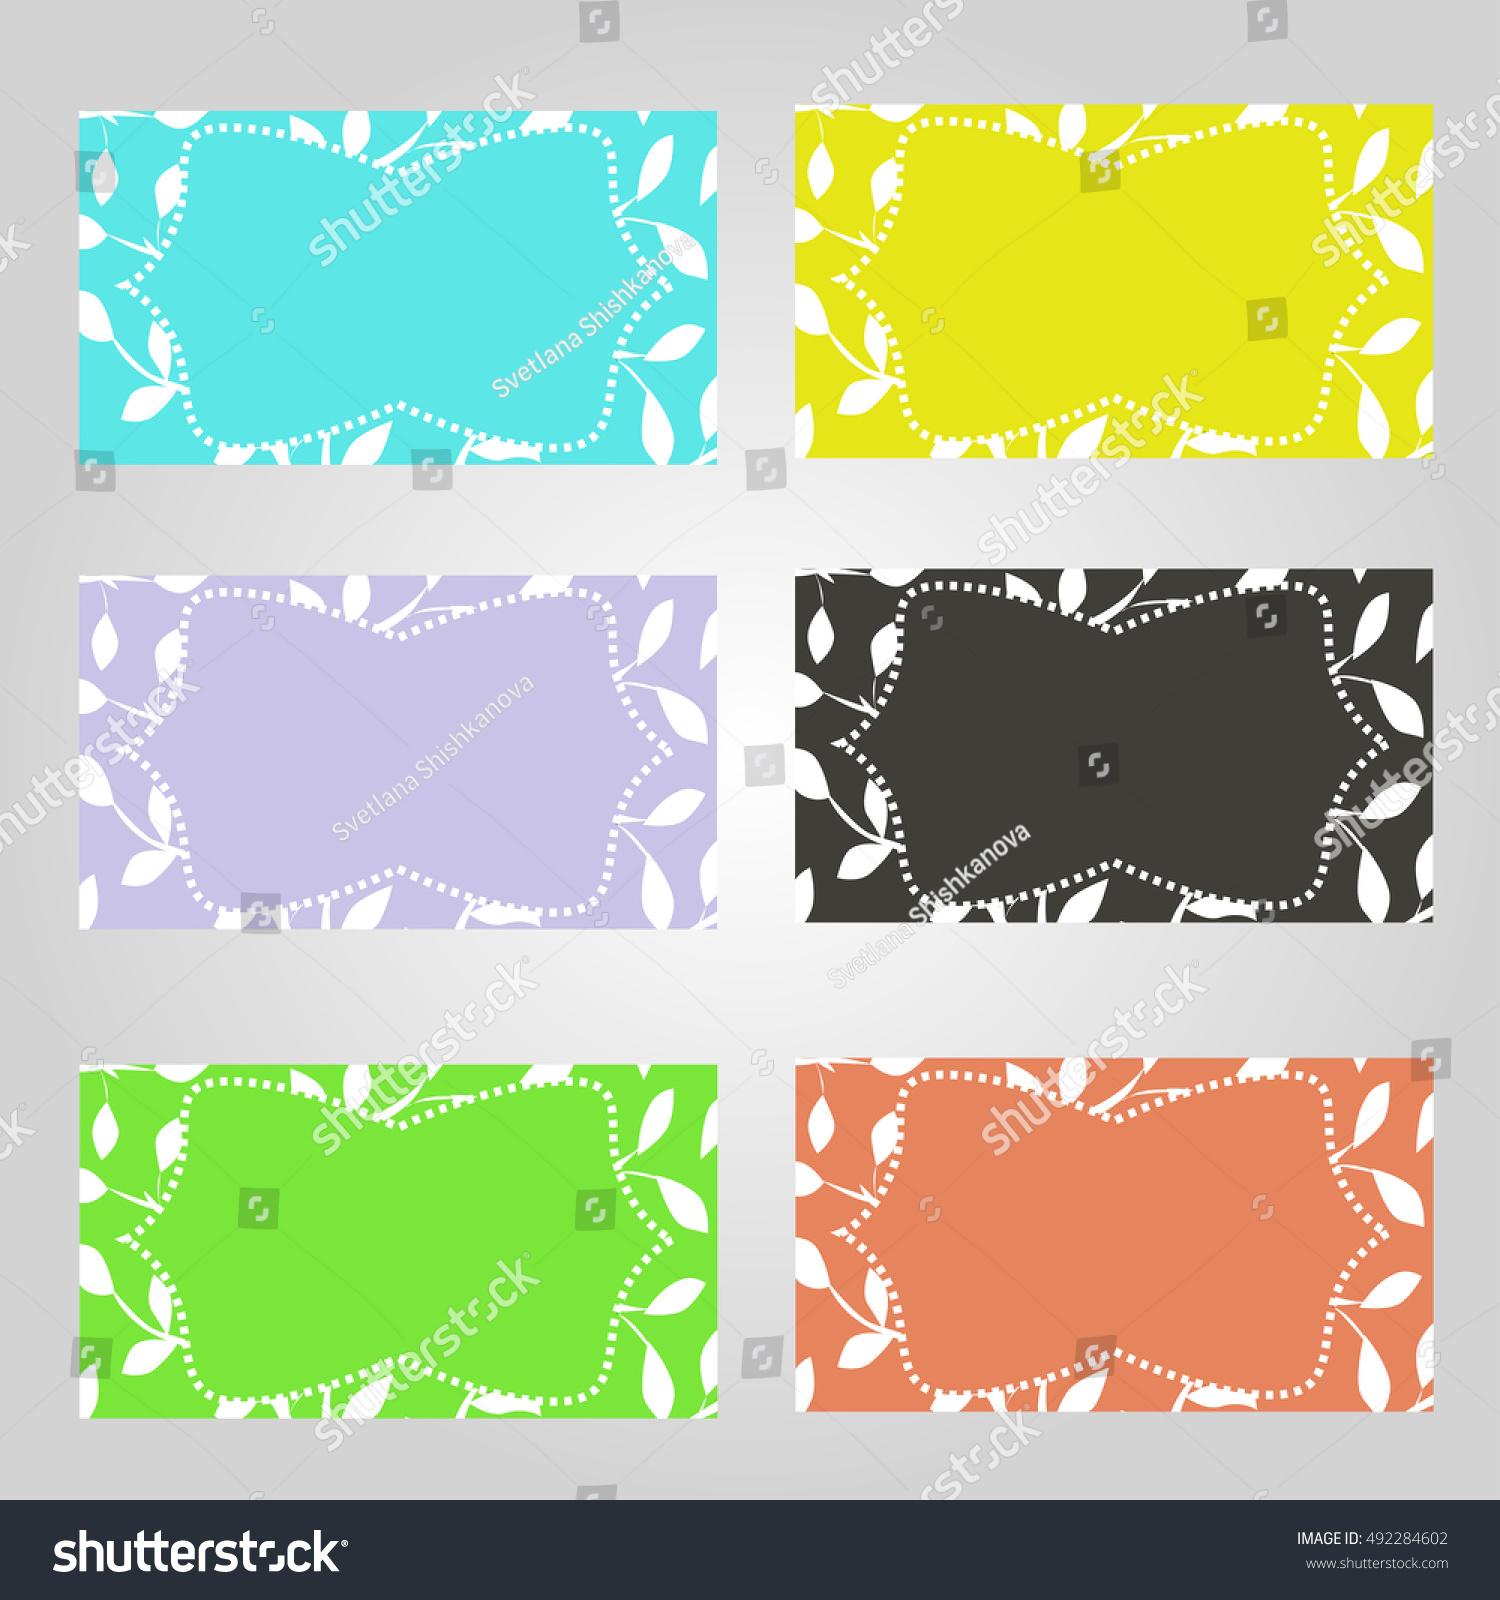 Set Six Horizontal Business Cards Different Stock Illustration ...